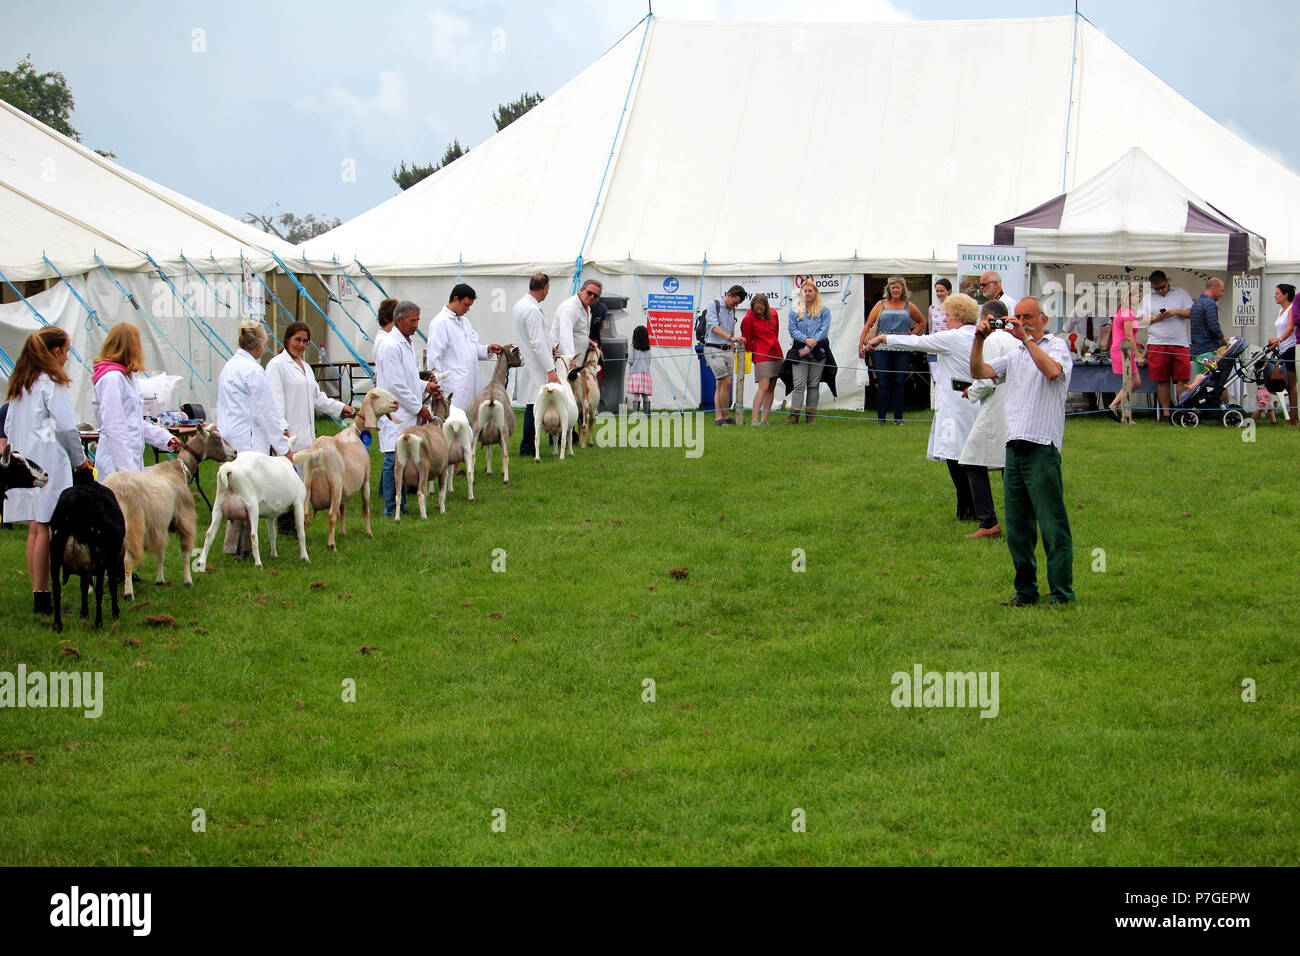 Guildford, England - May 28 2018: Judges at the Surrey